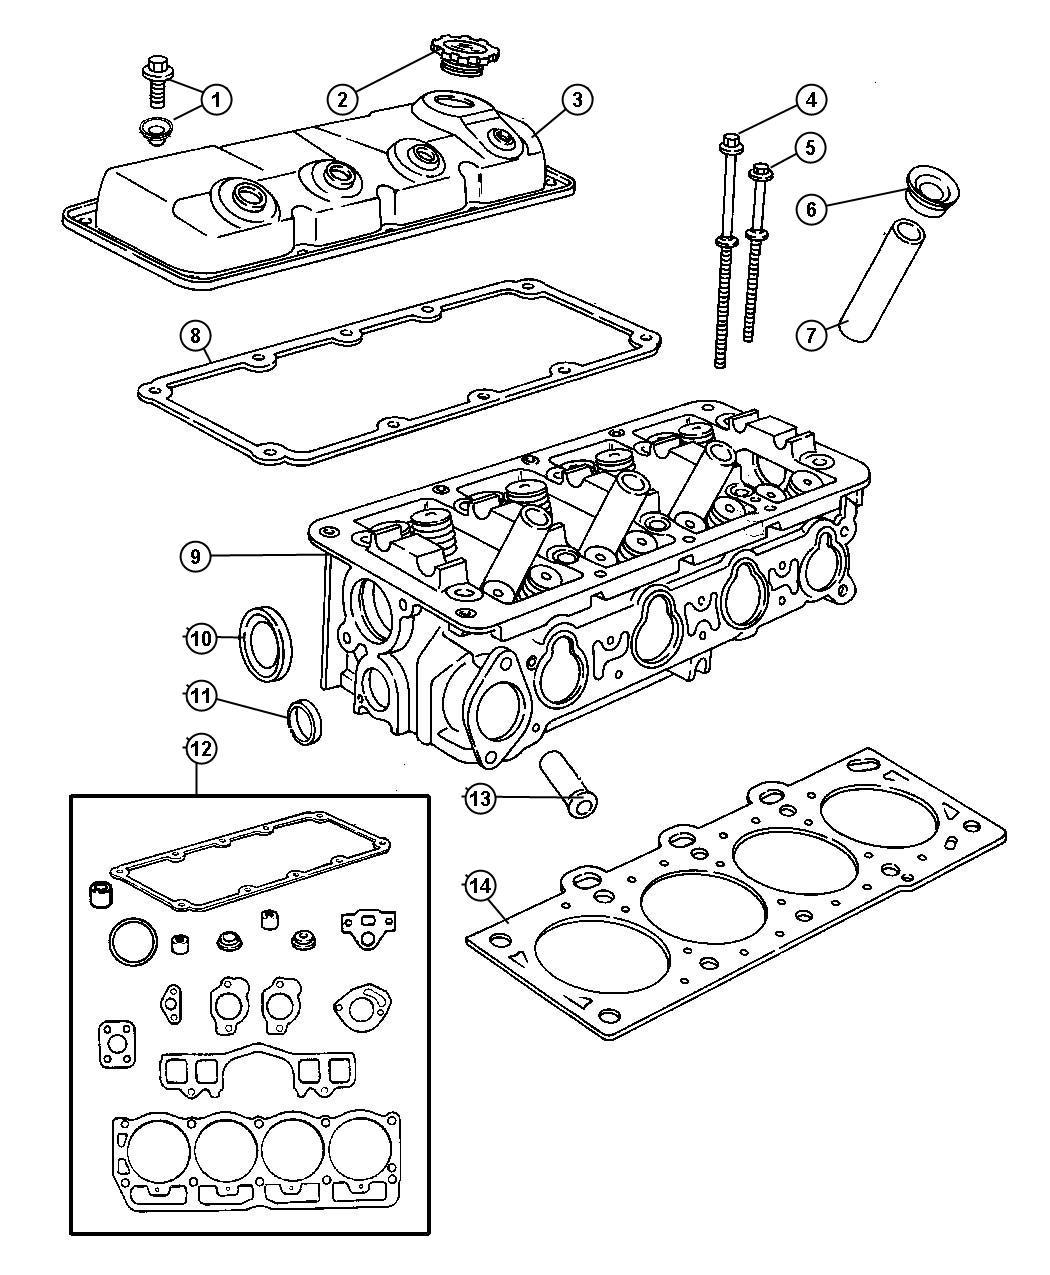 2001 dodge neon gasket package  engine upper  see note  emissions  eurochili  coatn